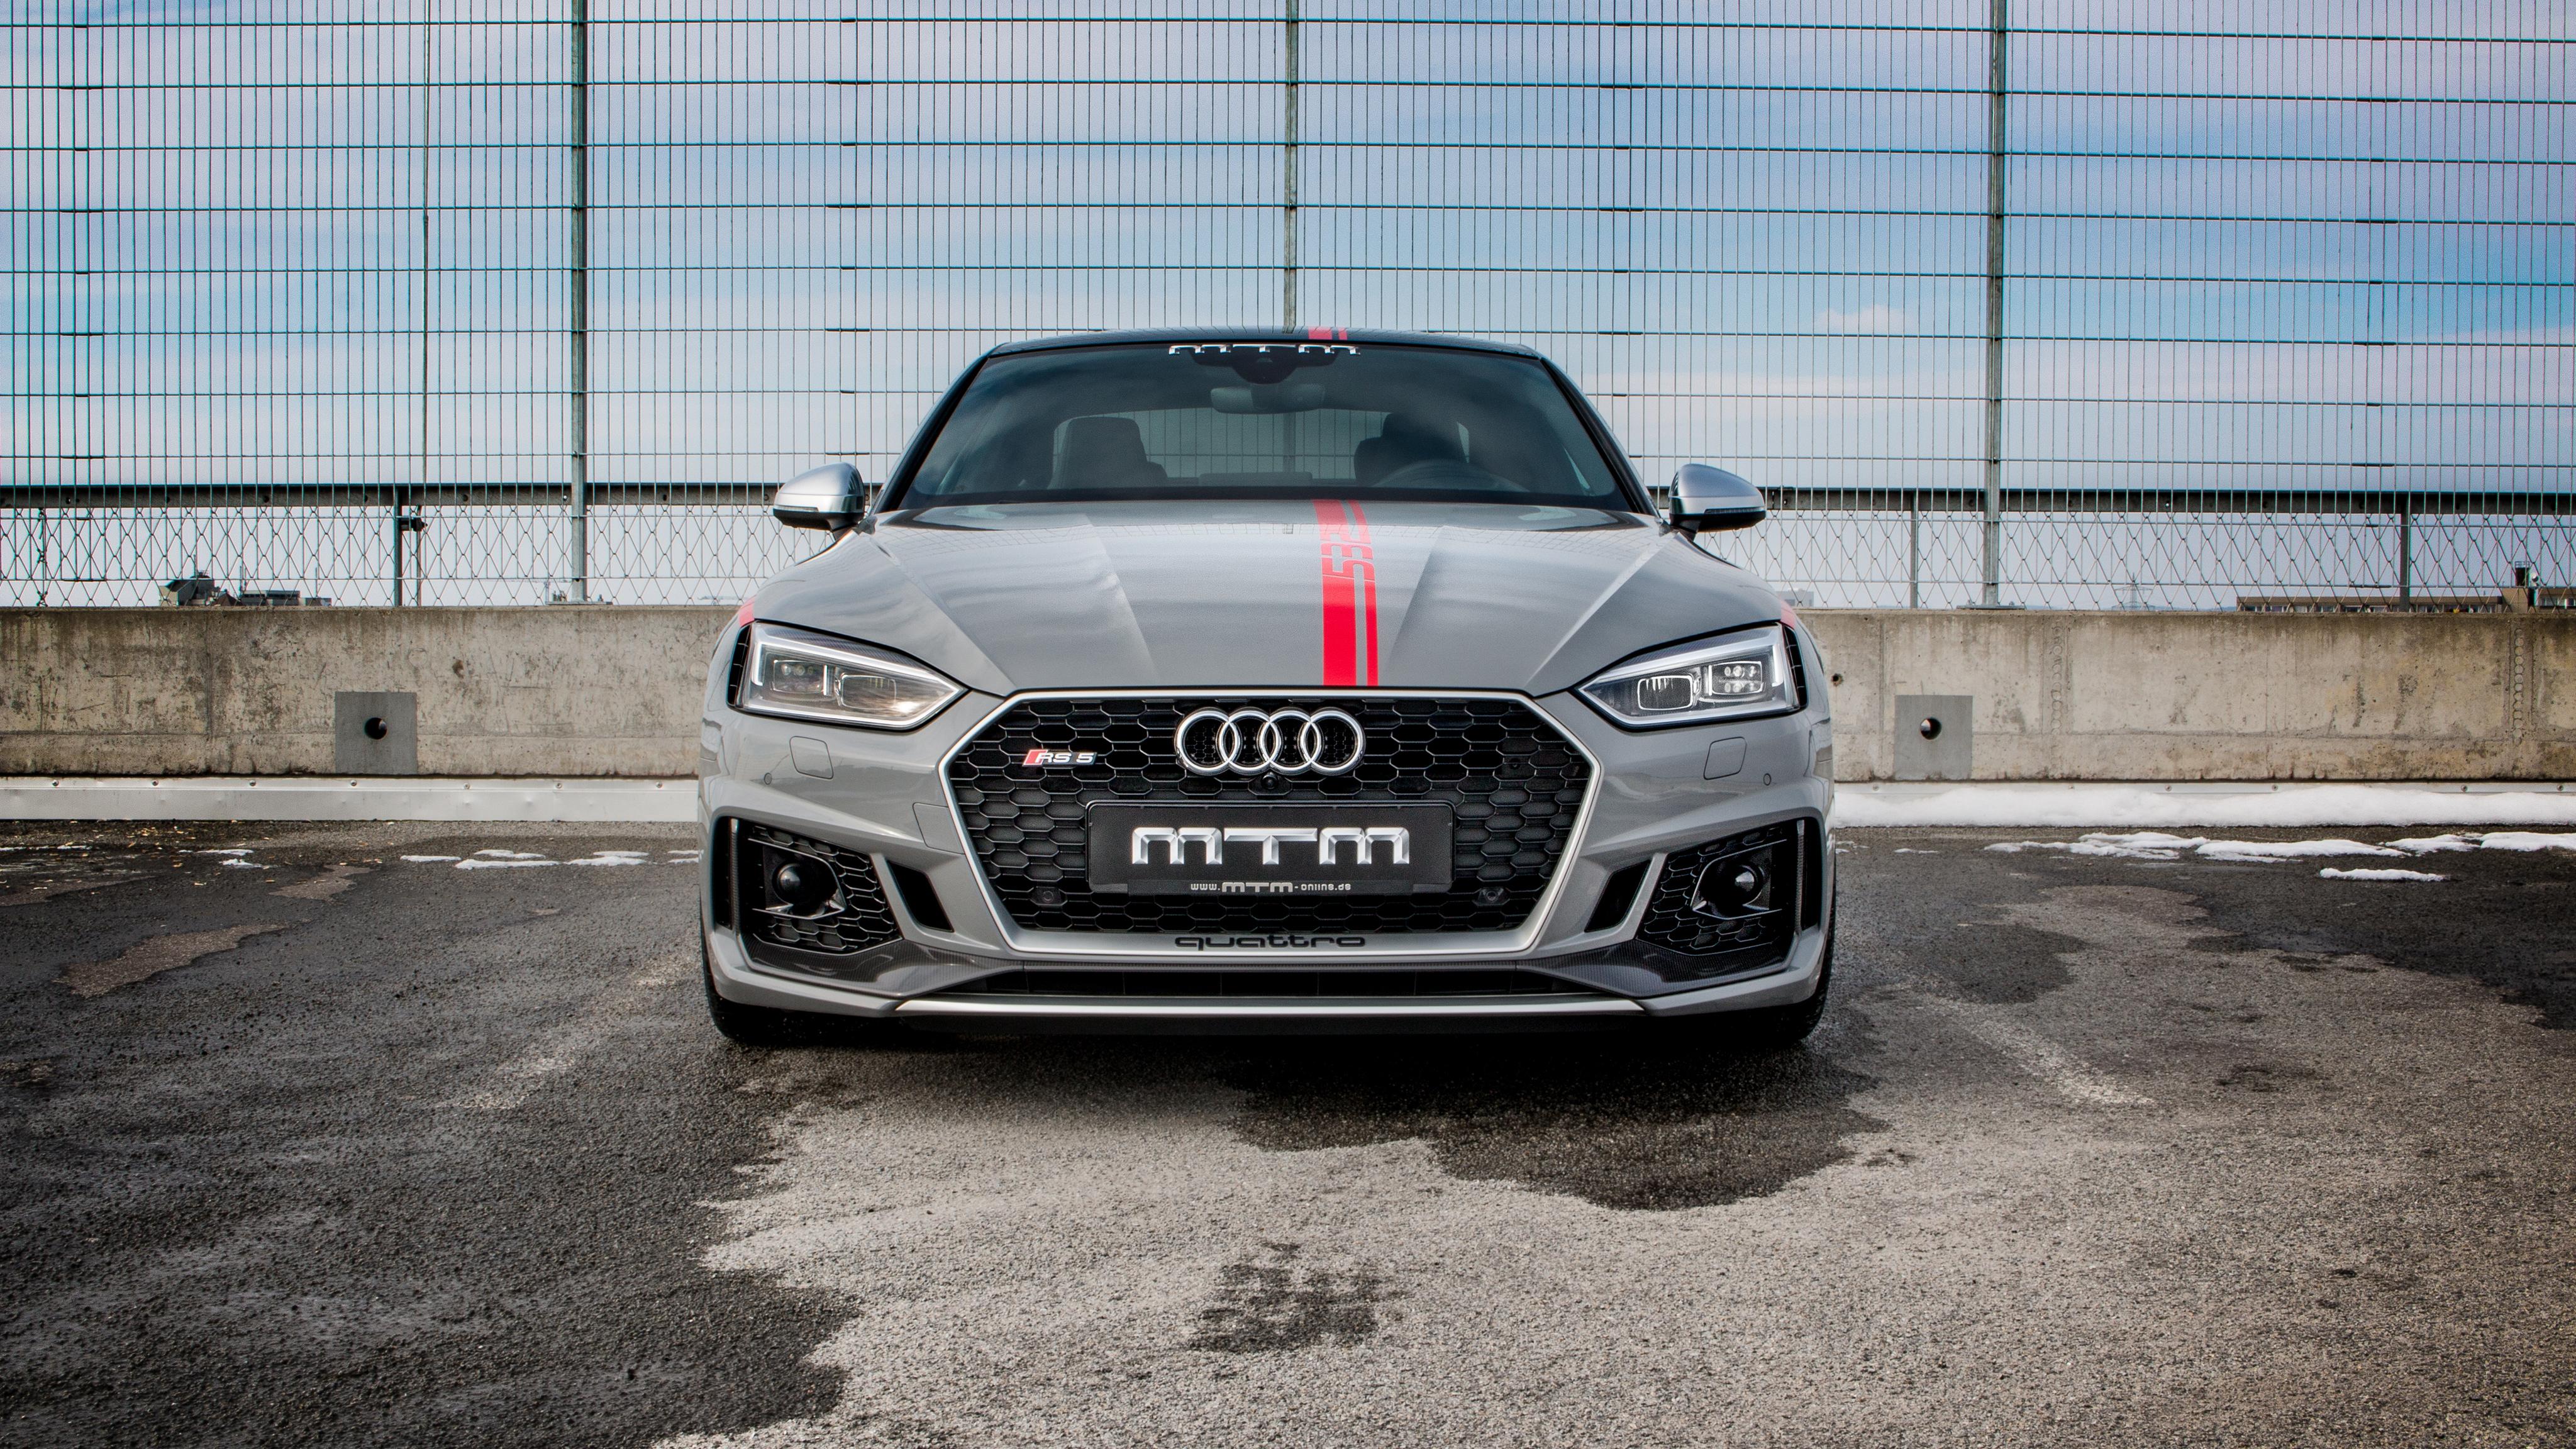 2018 Mtm Audi Rs5 R 4k Wallpaper Hd Car Wallpapers Id